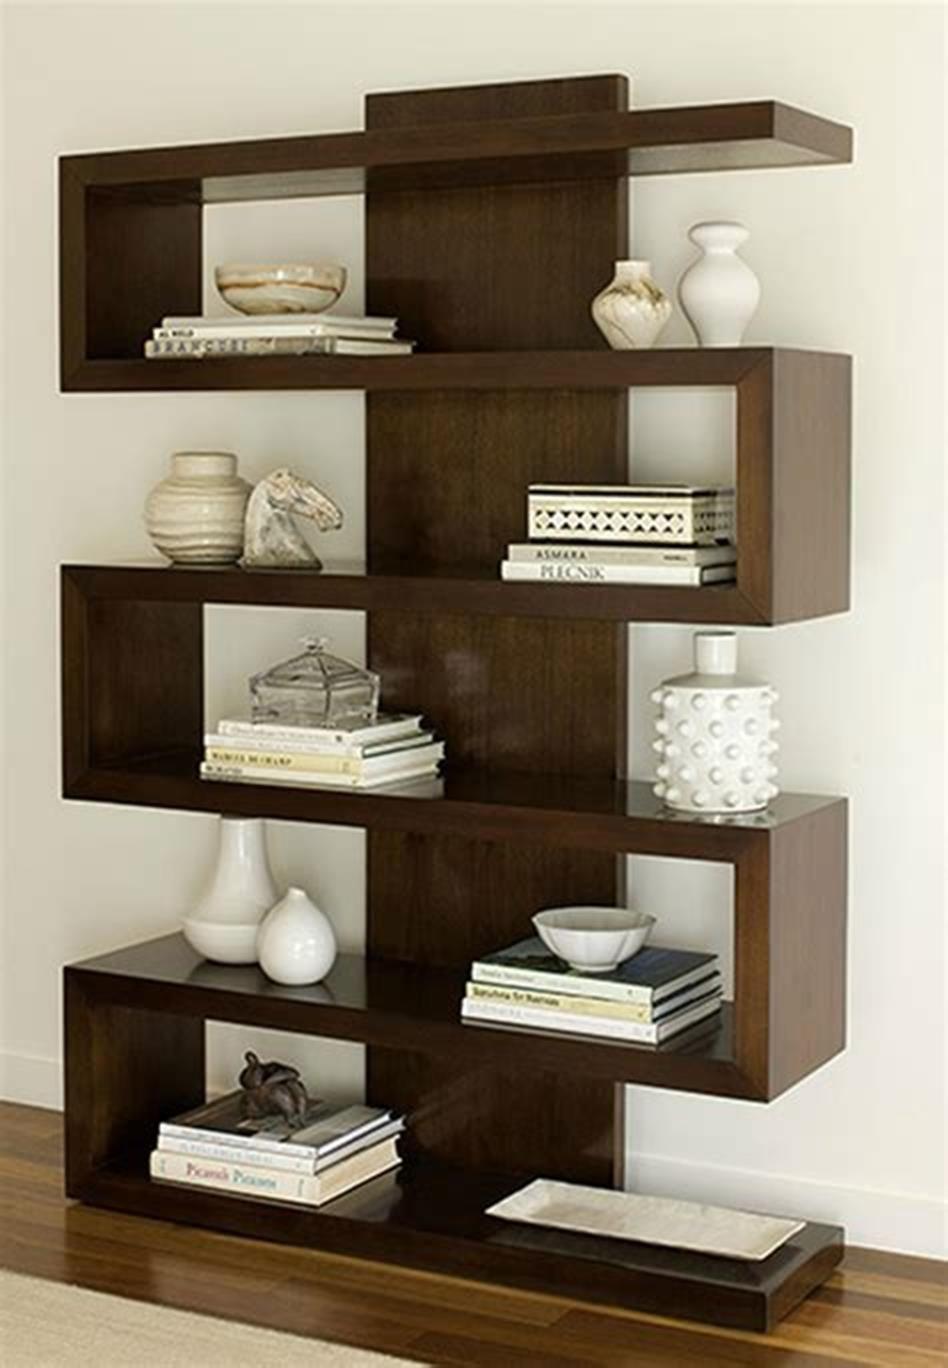 35 Unique And Creative Bookshelves Design Ideas Decorecent Bookshelf Design Bookshelves Diy Contemporary Bookshelf